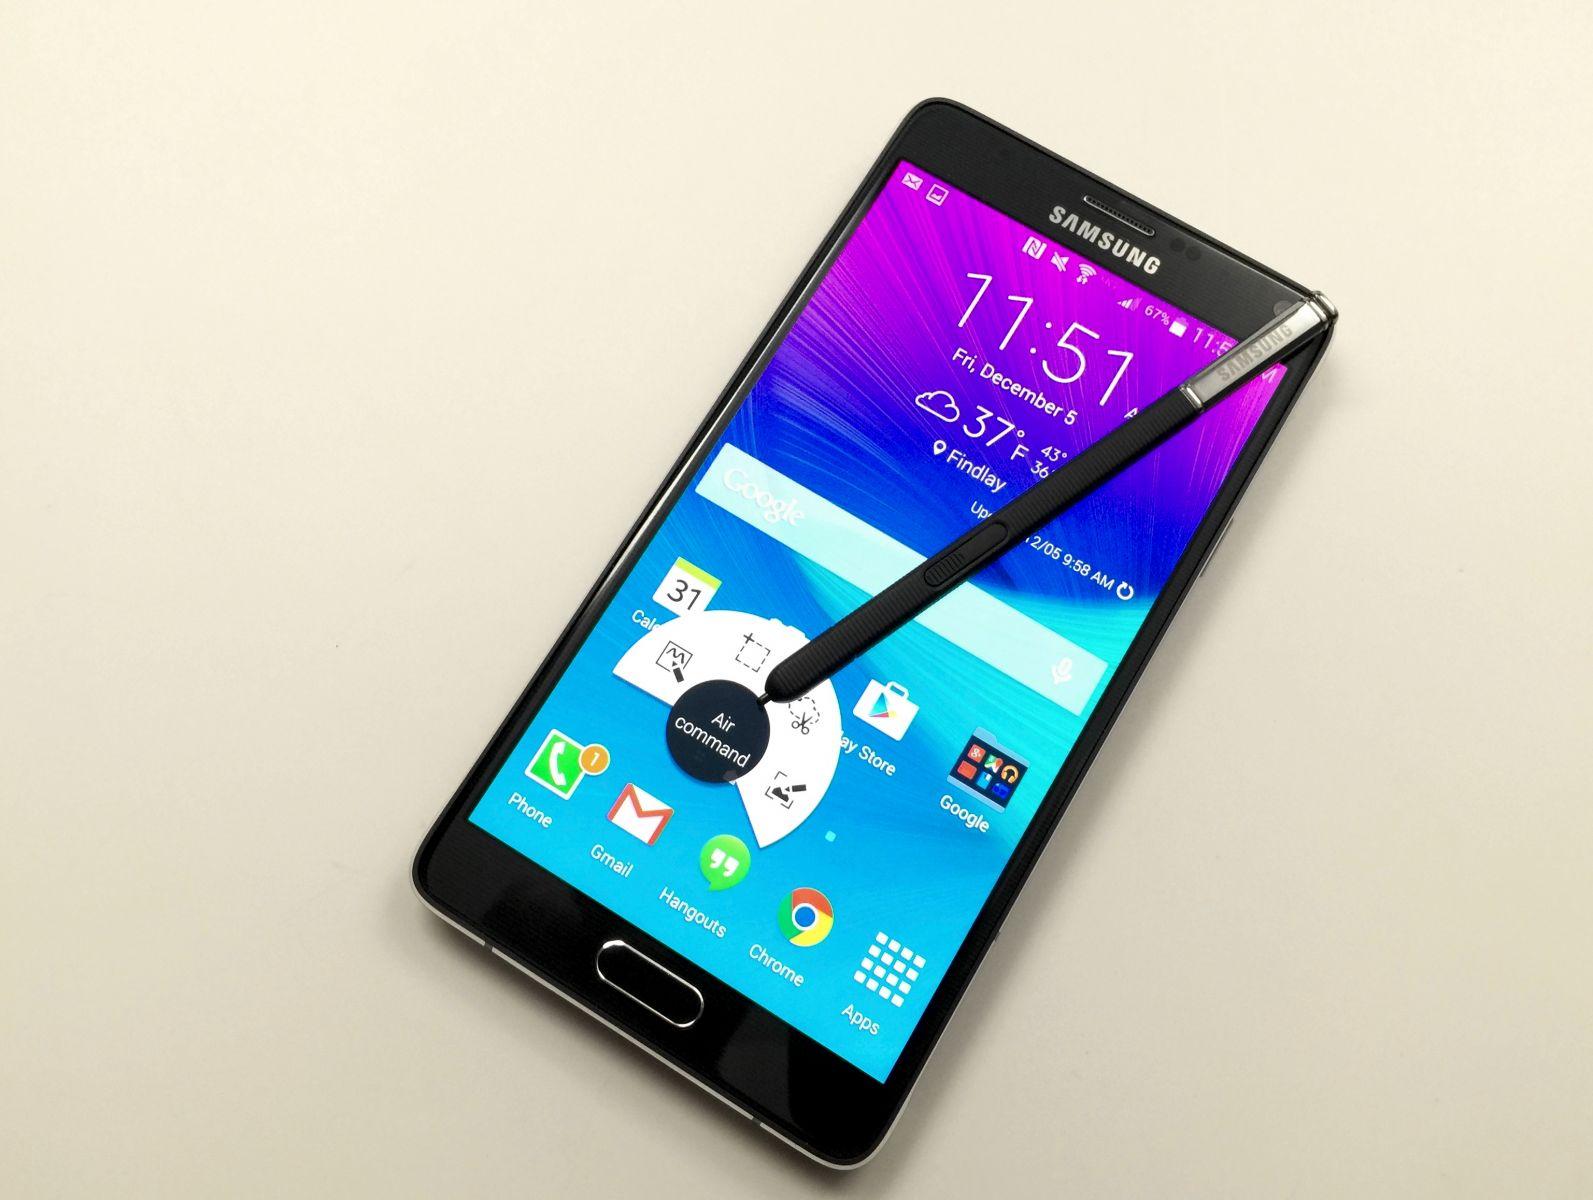 Android Lollipop no Samsung Galaxy Note 4